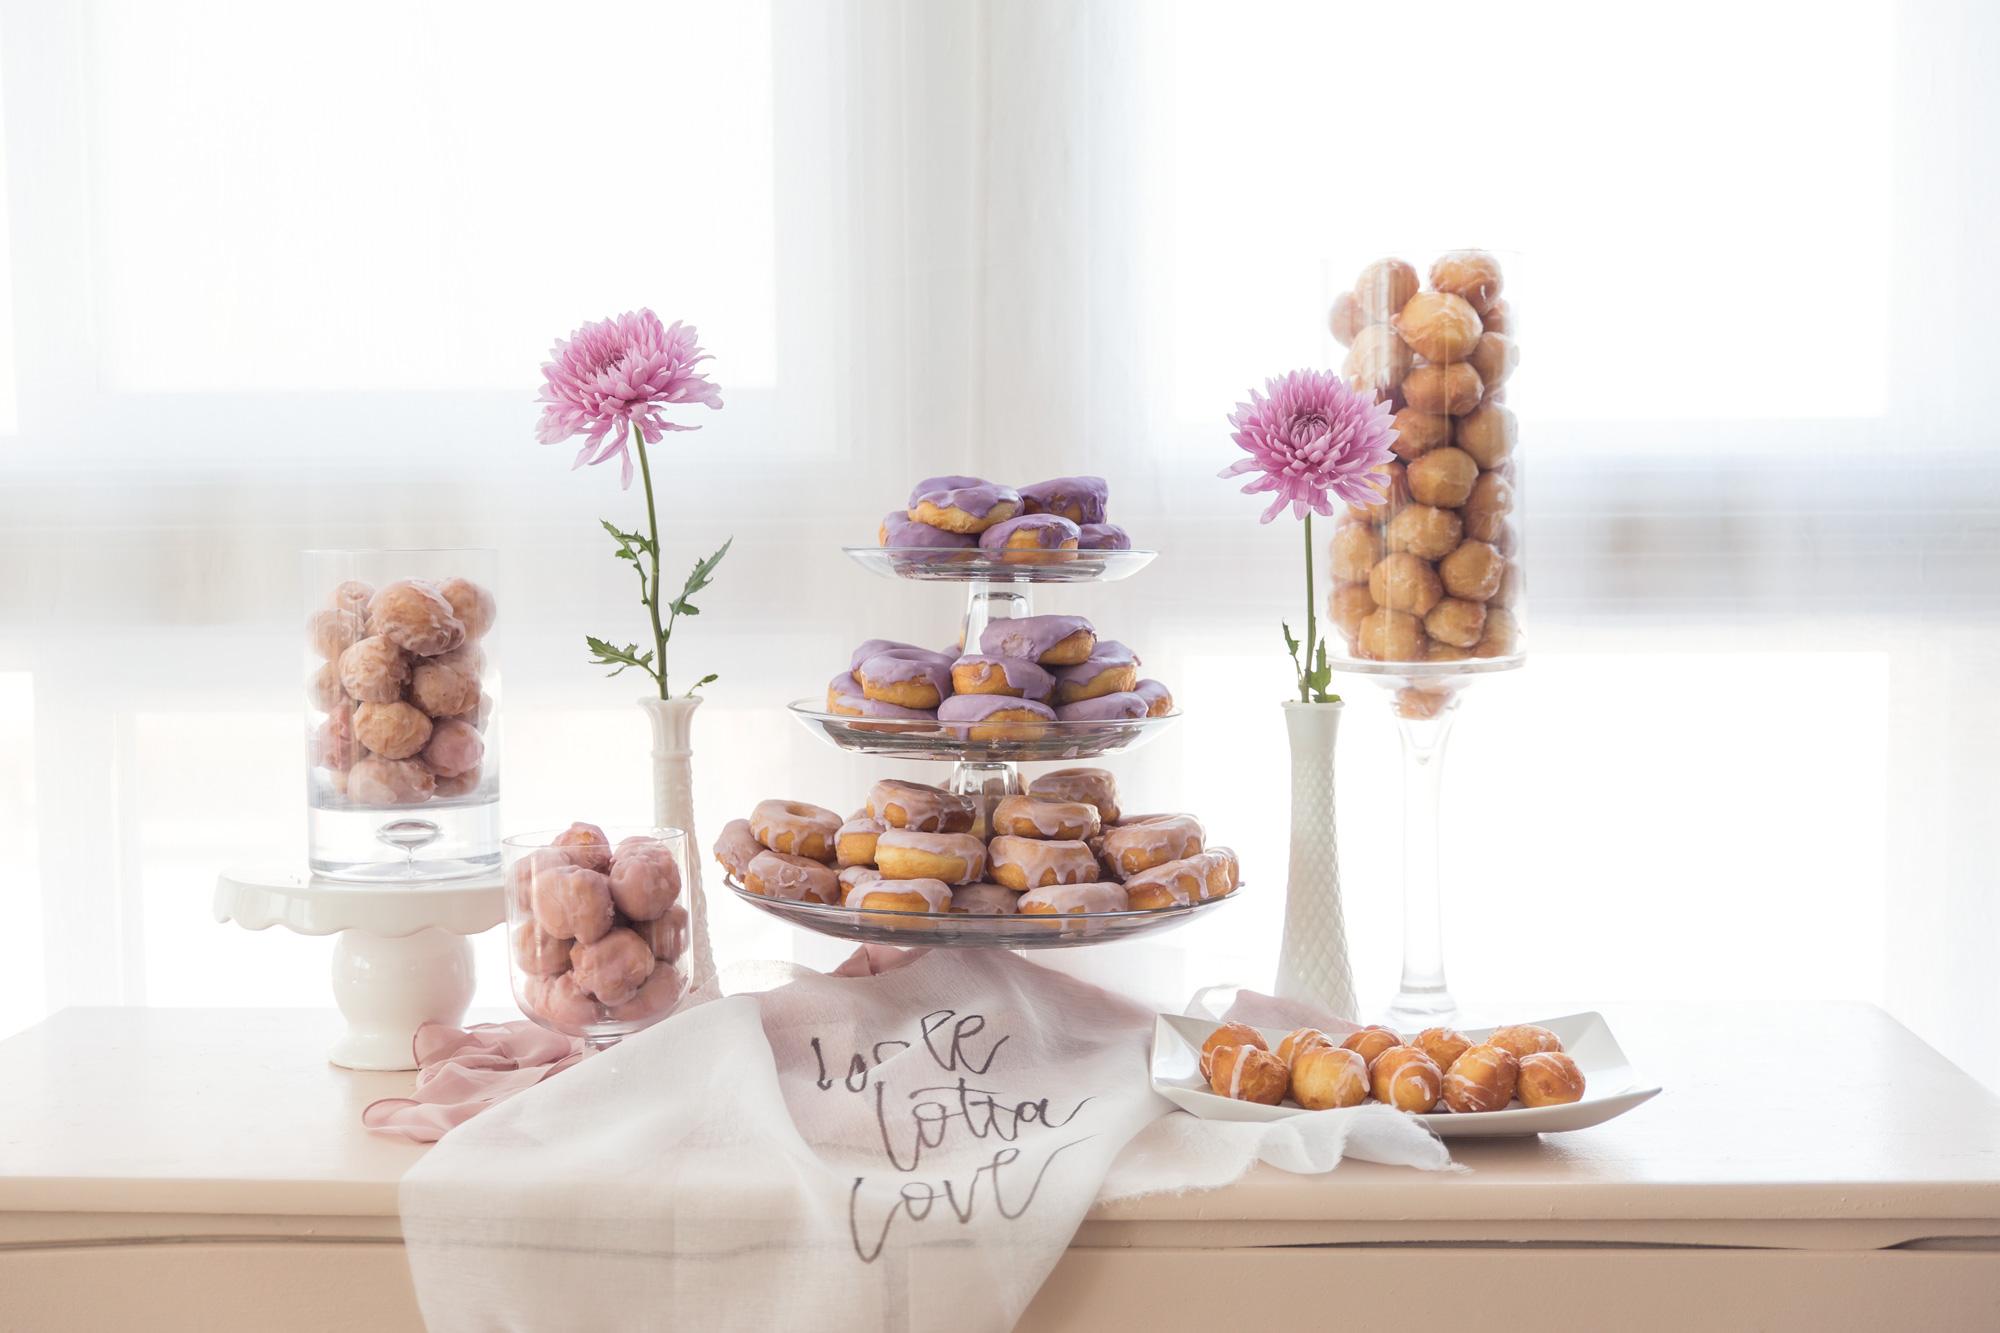 donut-table-spread-bay-area-branding-photography-san-jose-san-francisco.jpg